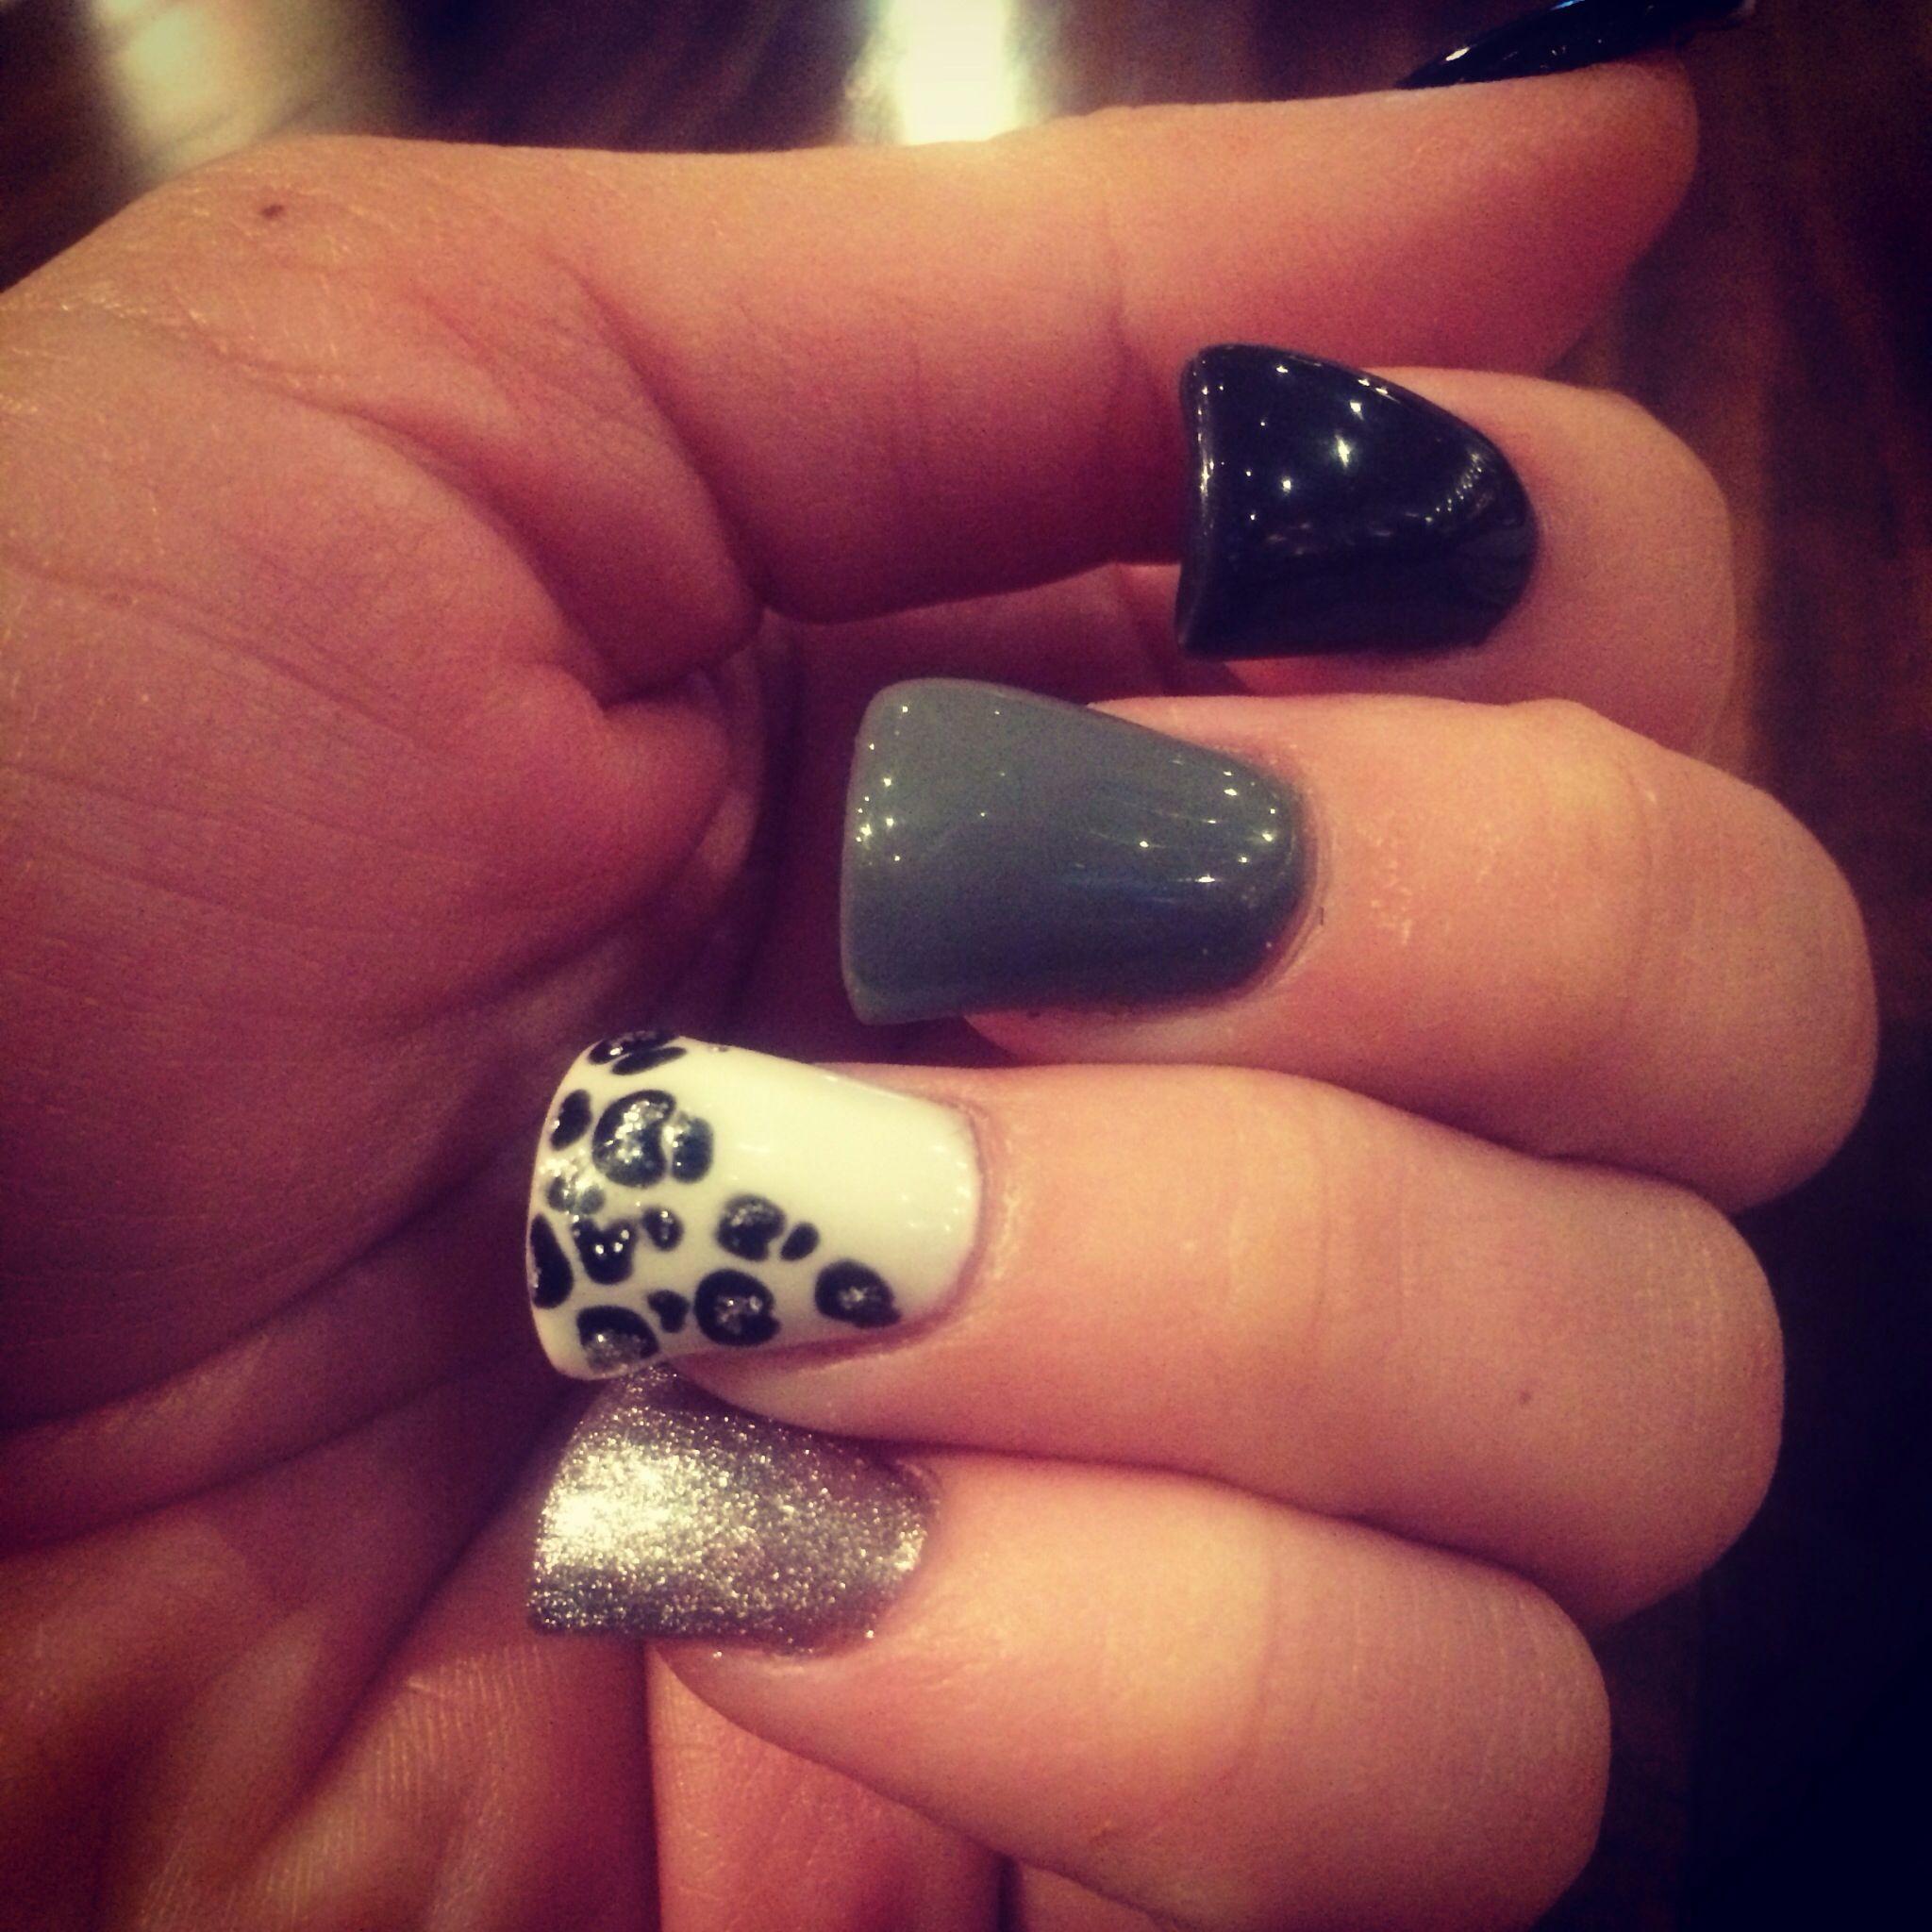 Winter Cheetah print nails - Lush Nail Bar, Raleigh NC | Hair, Nails ...